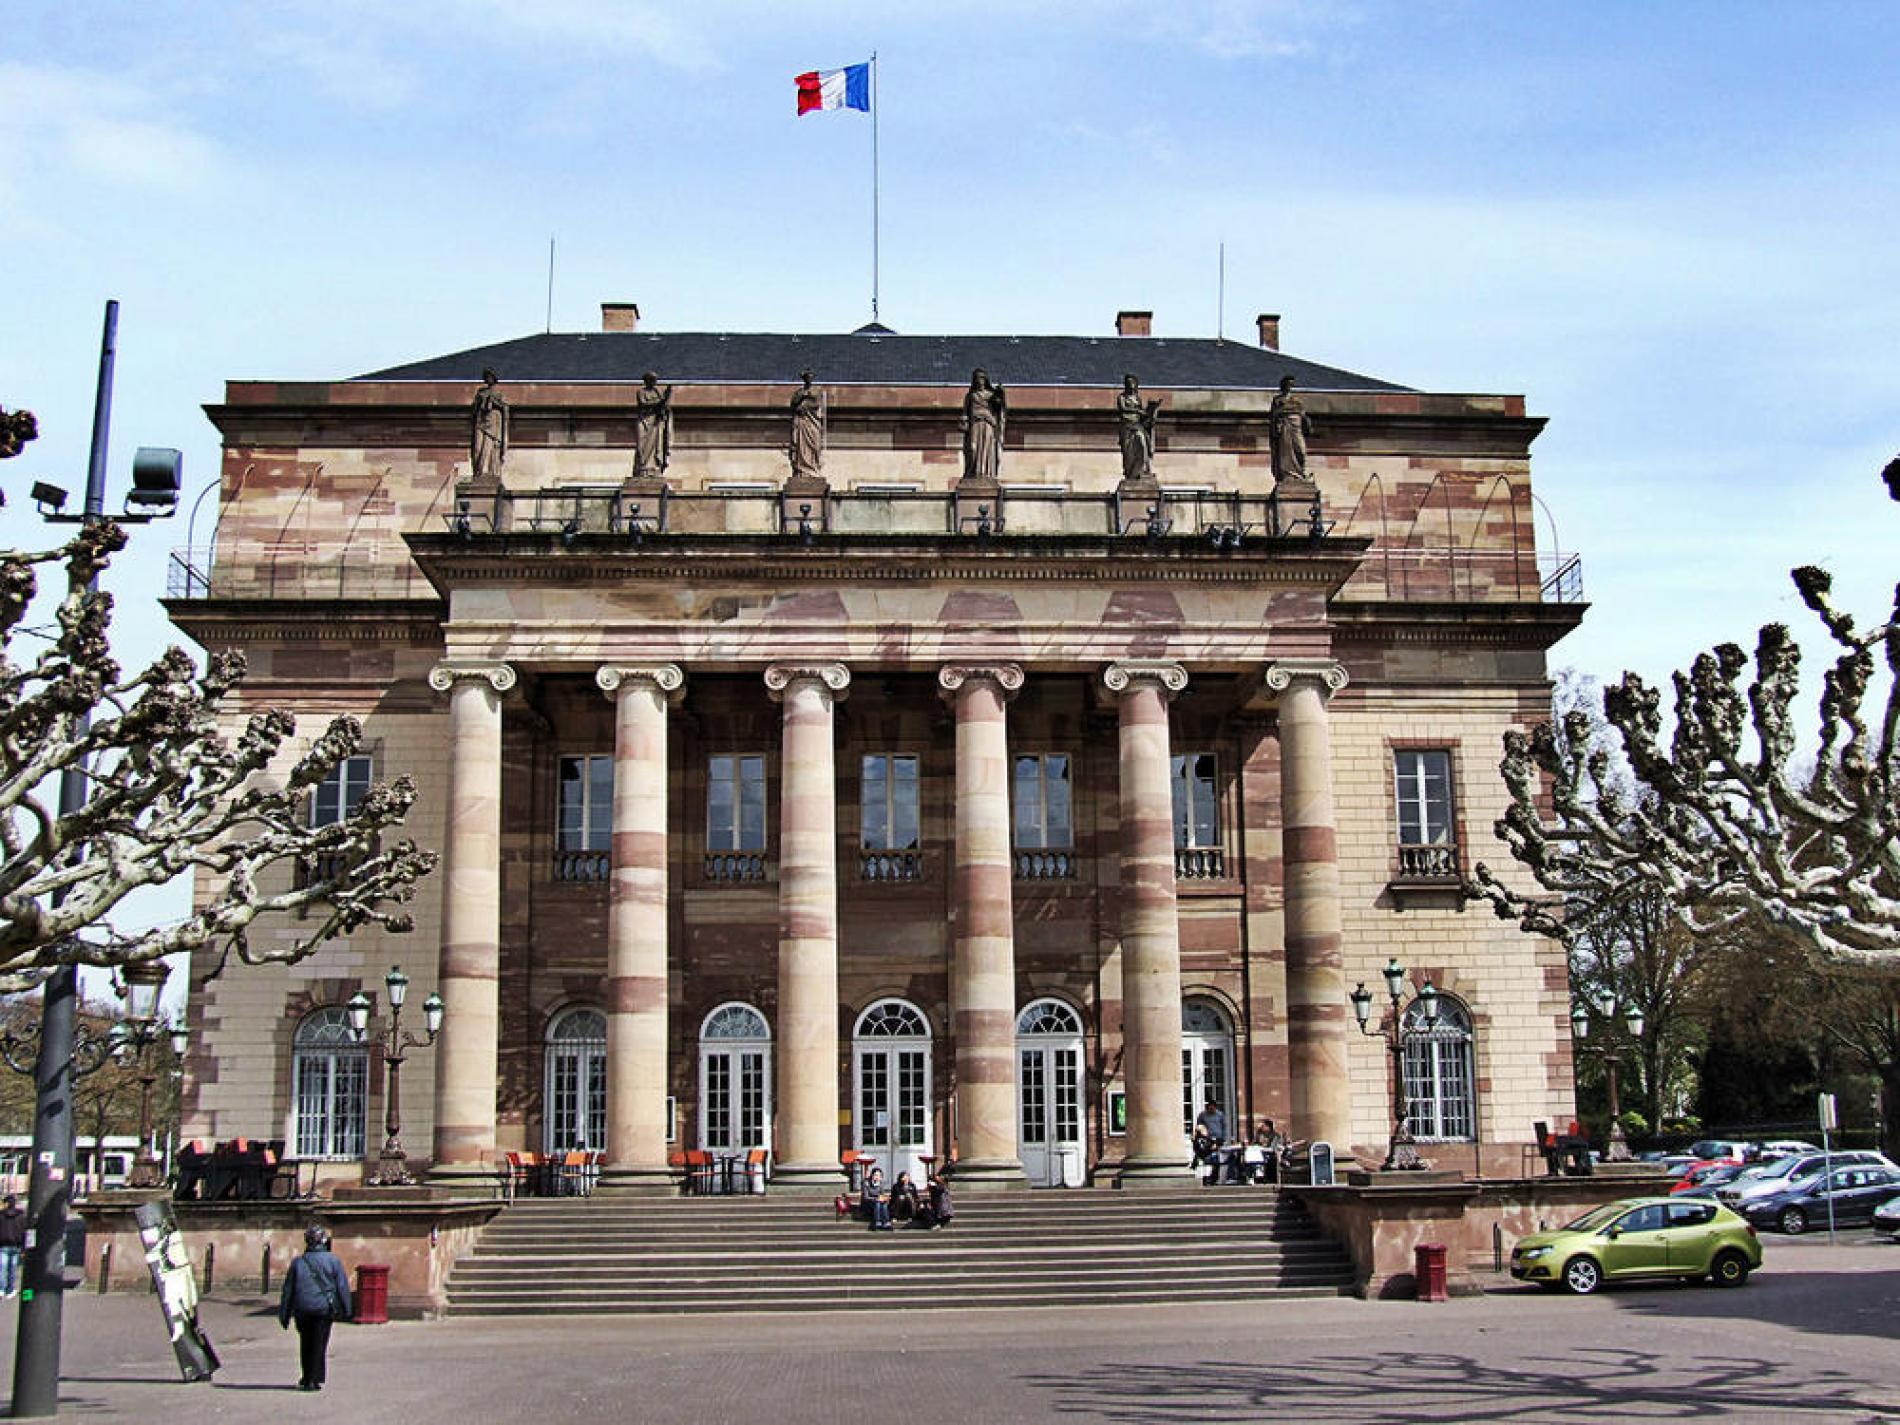 L'Opéra du Rhin